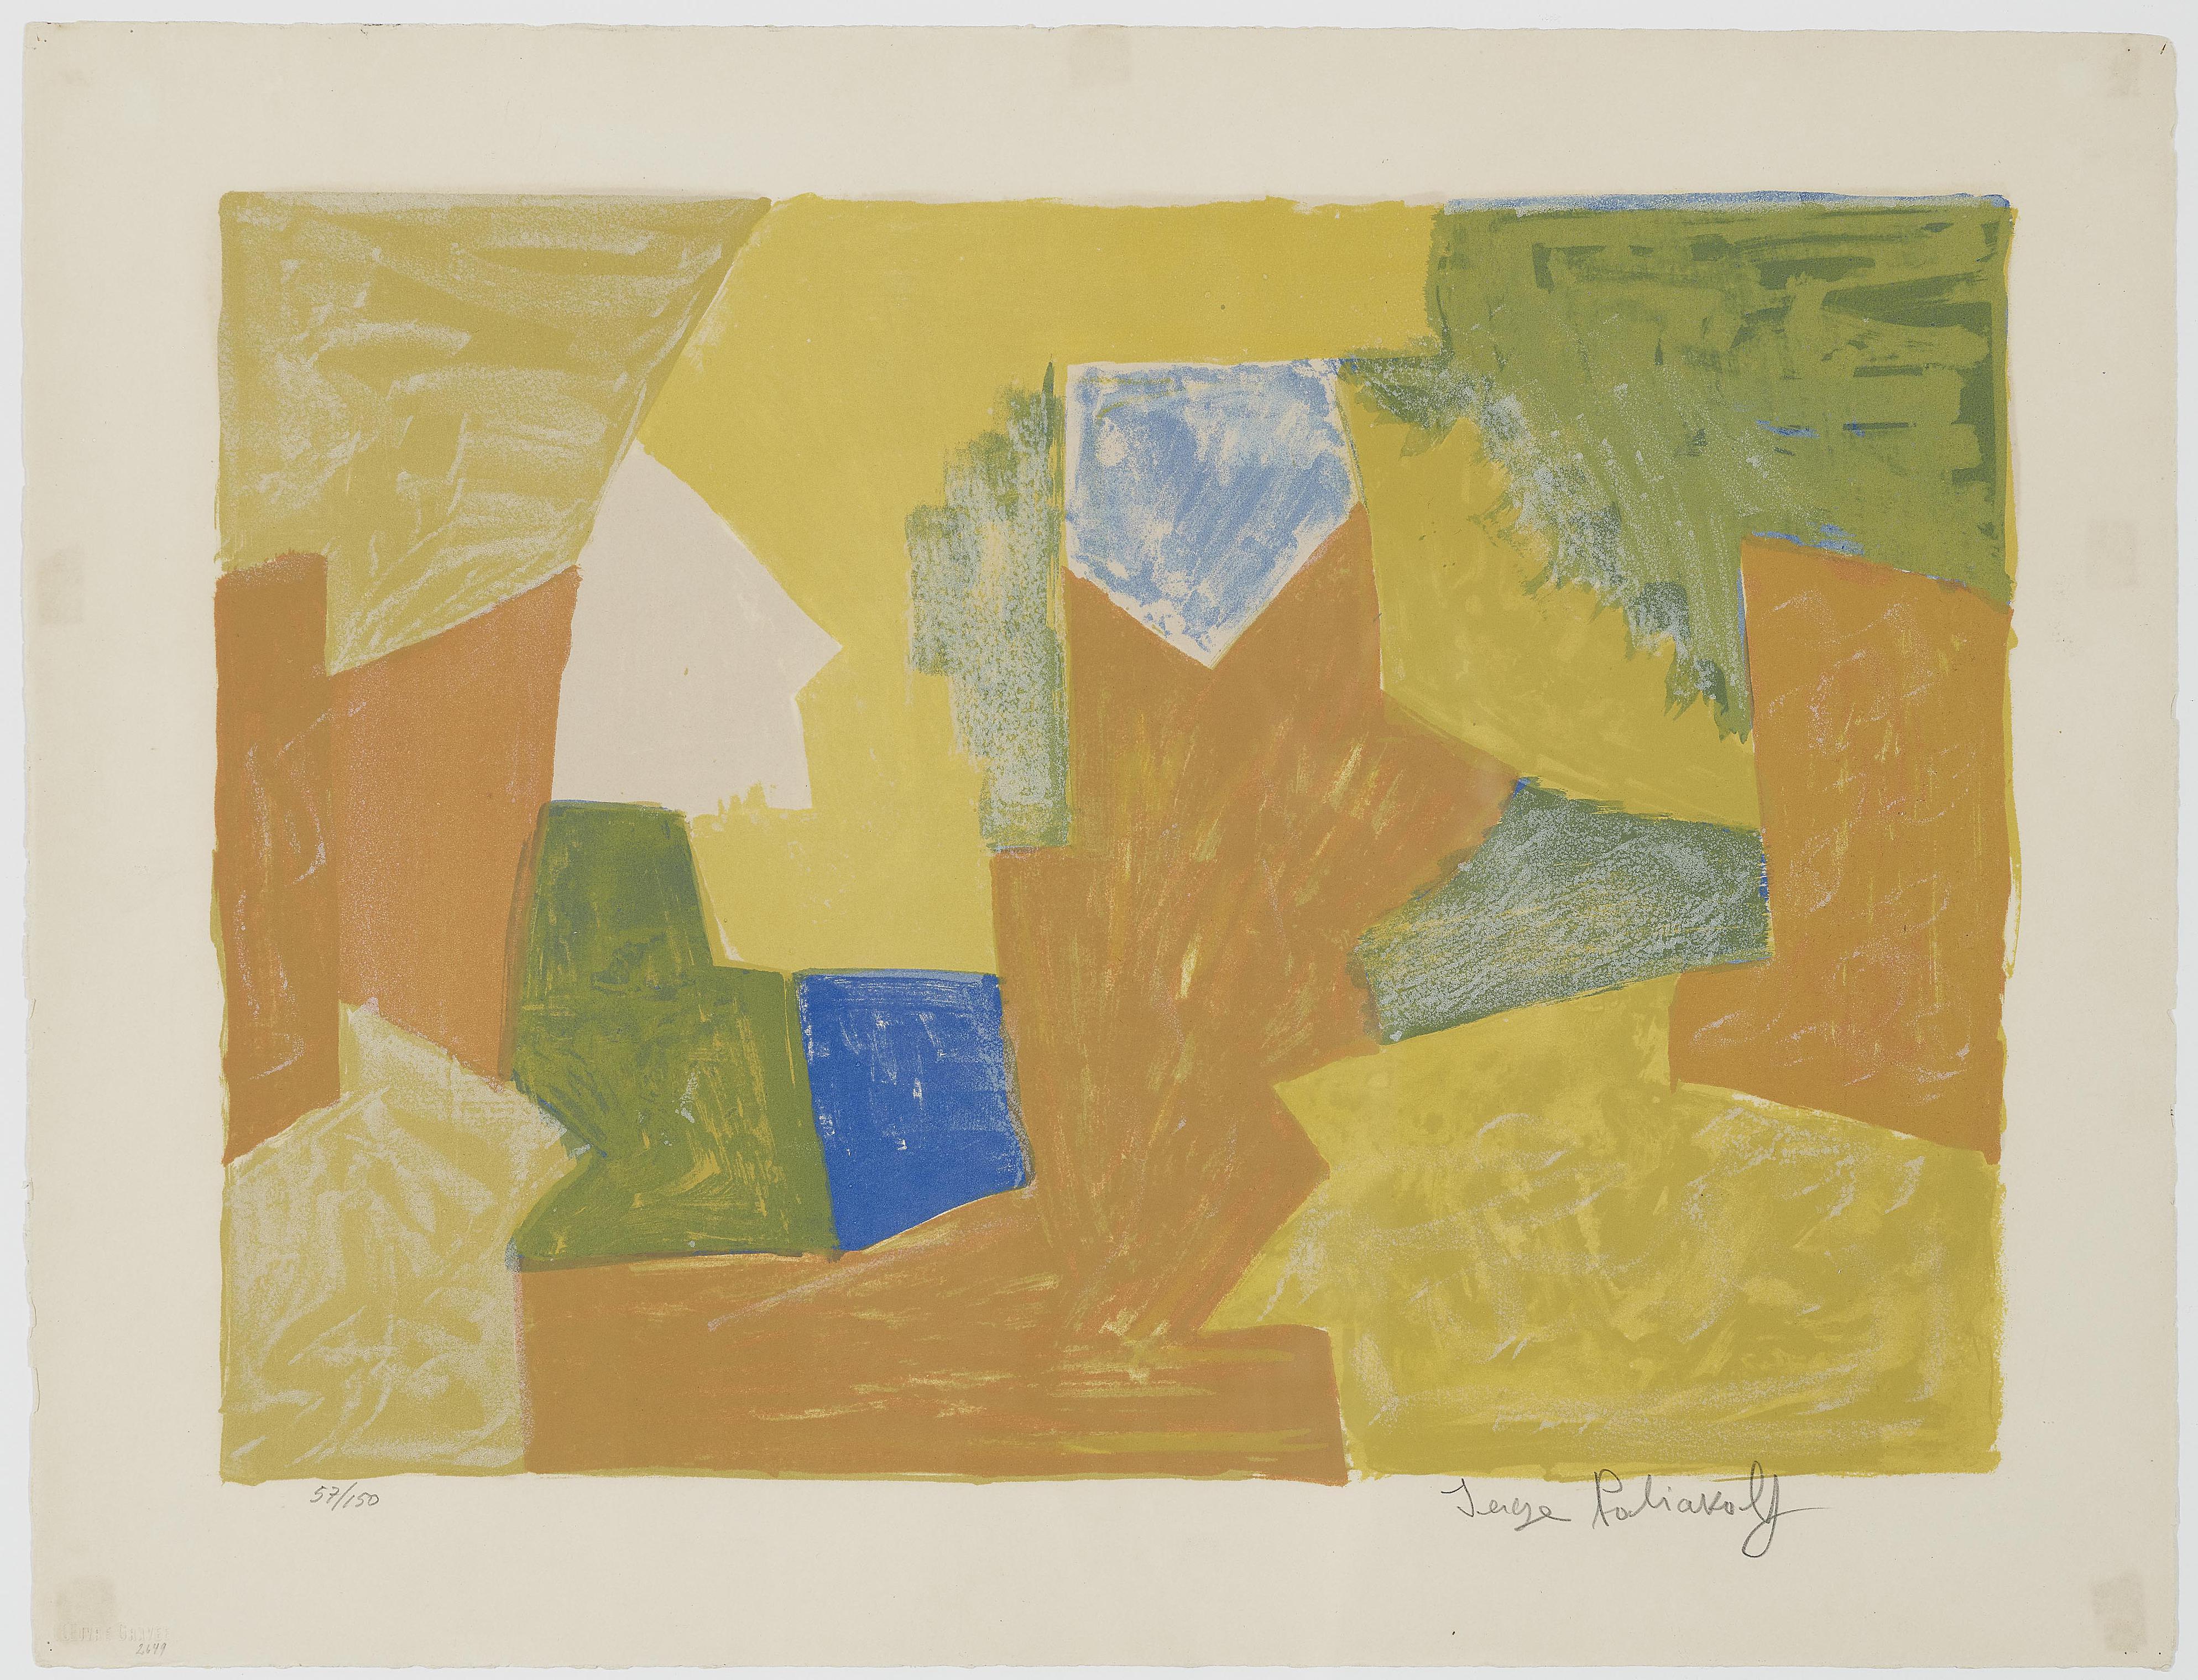 Serge Poliakoff-Composition Jaune, Orange Et Verte-1957